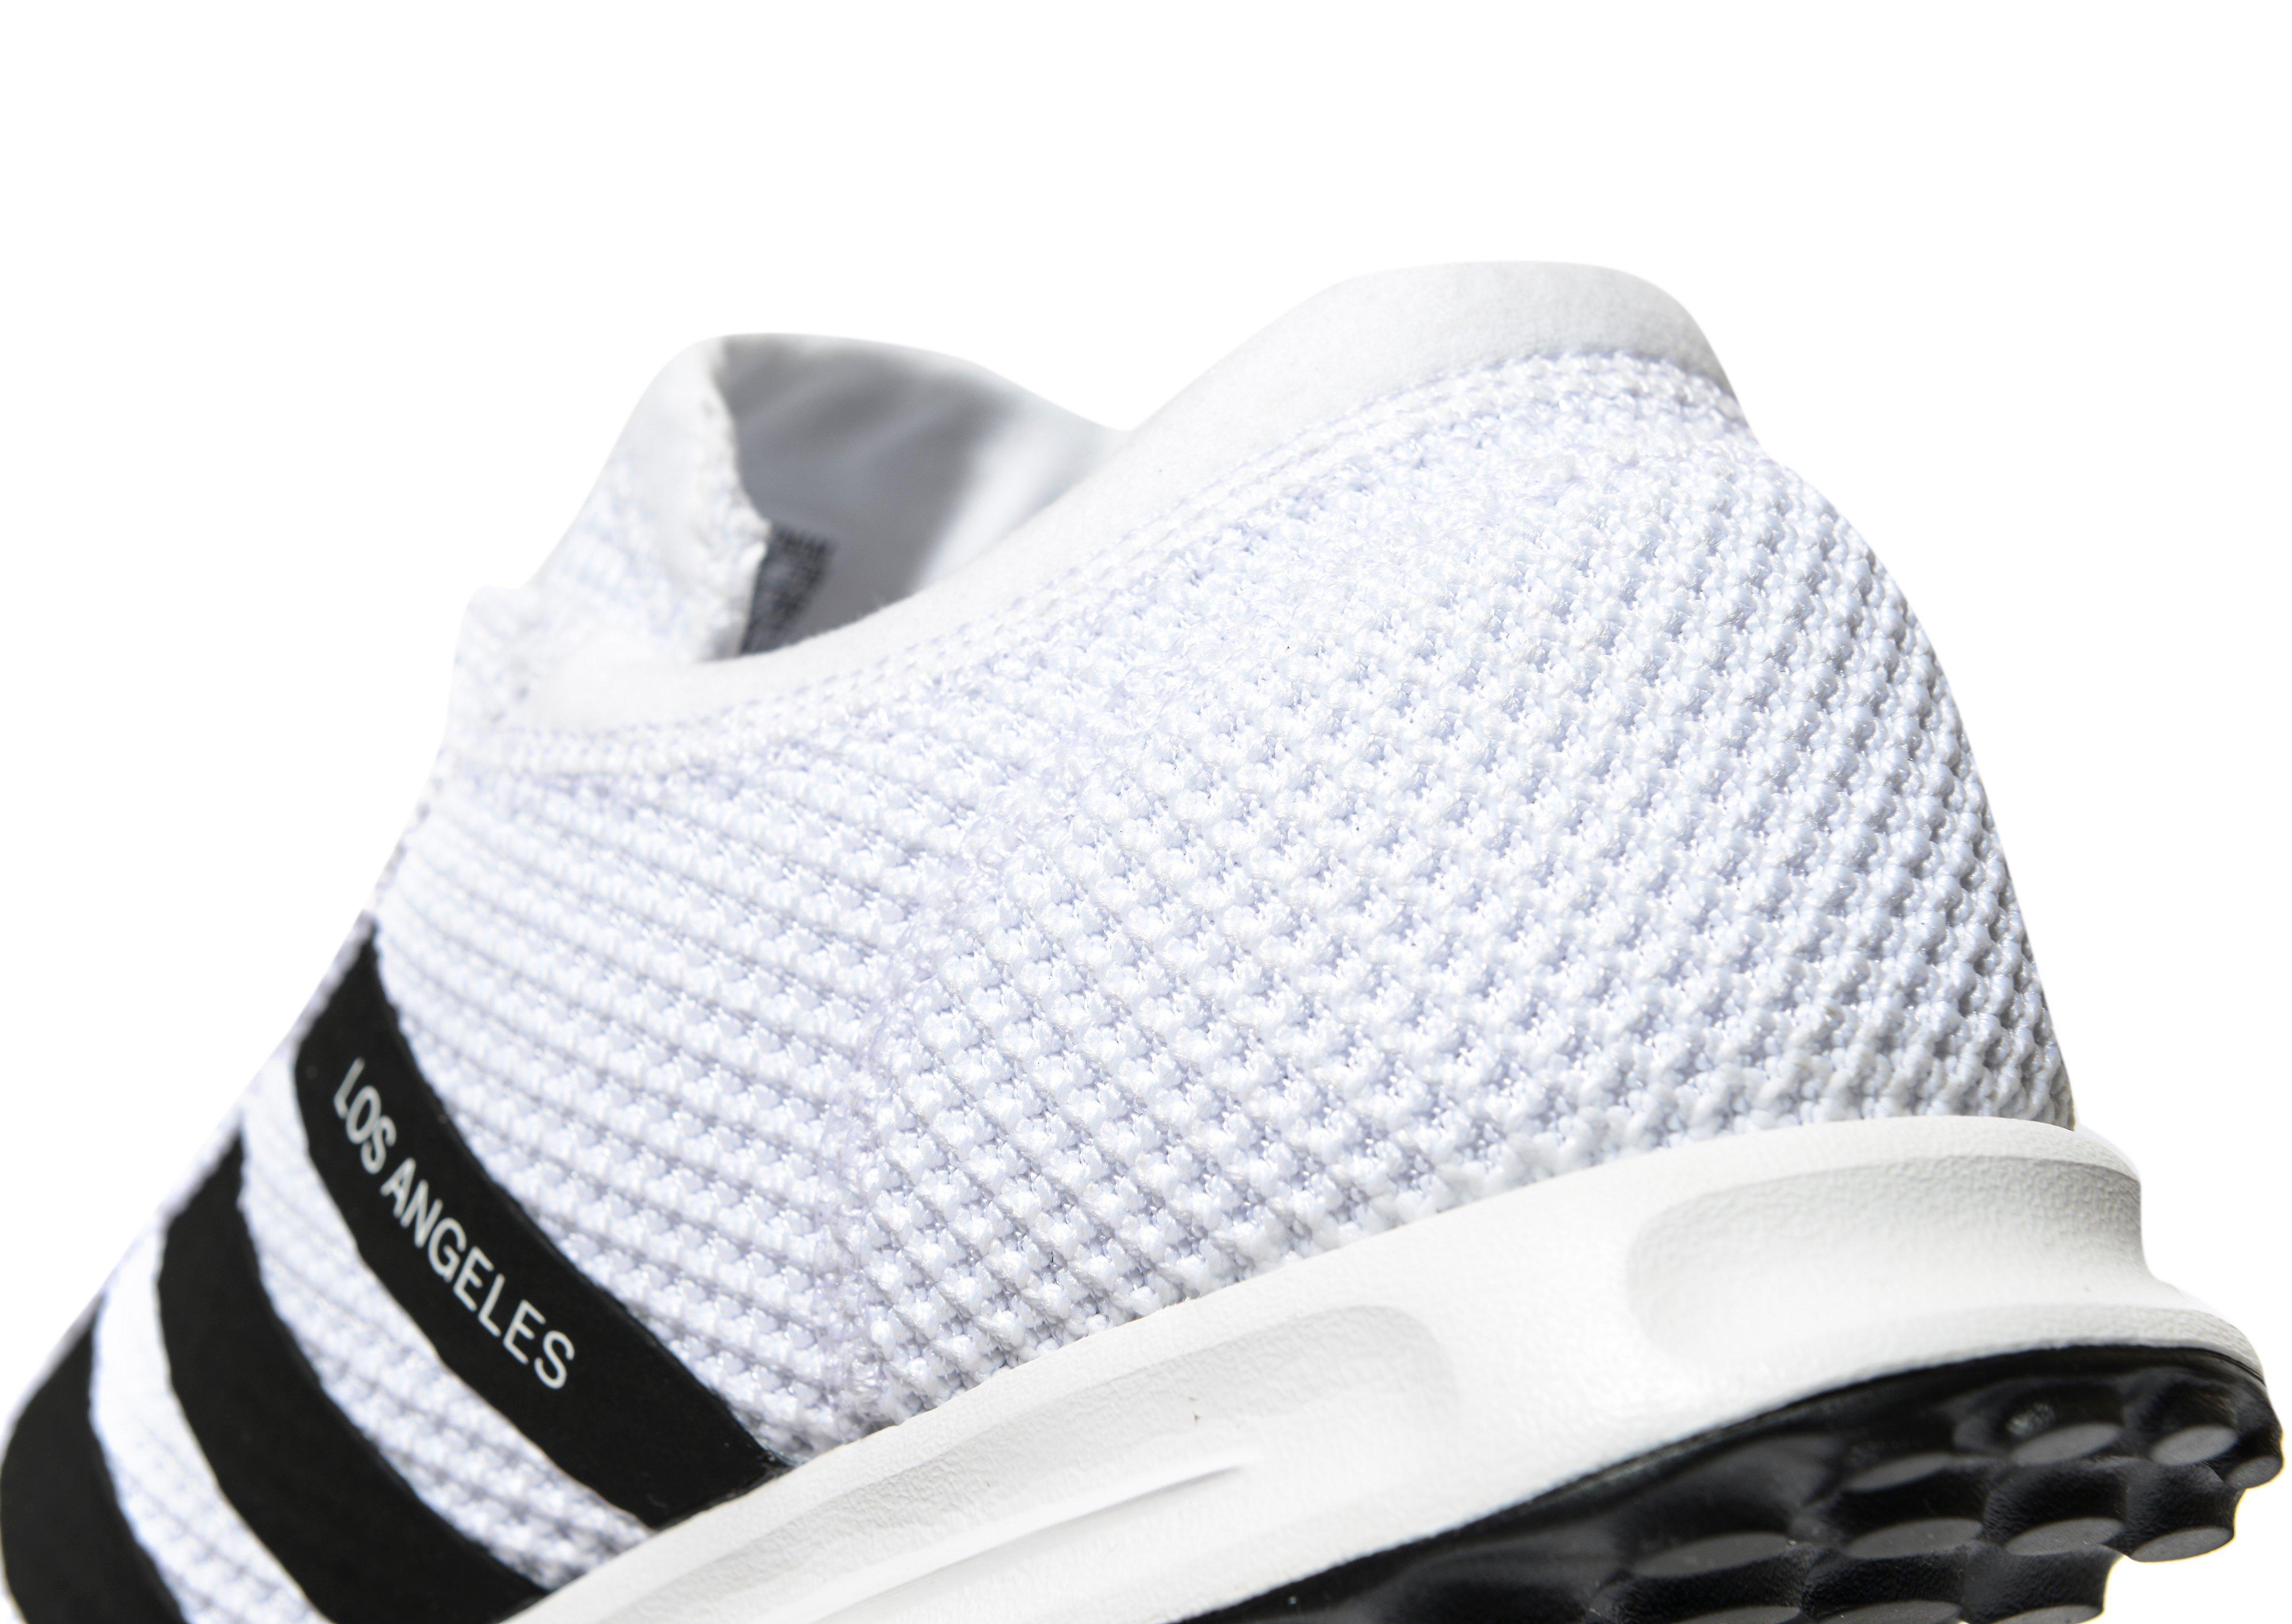 adidas los angeles white and black